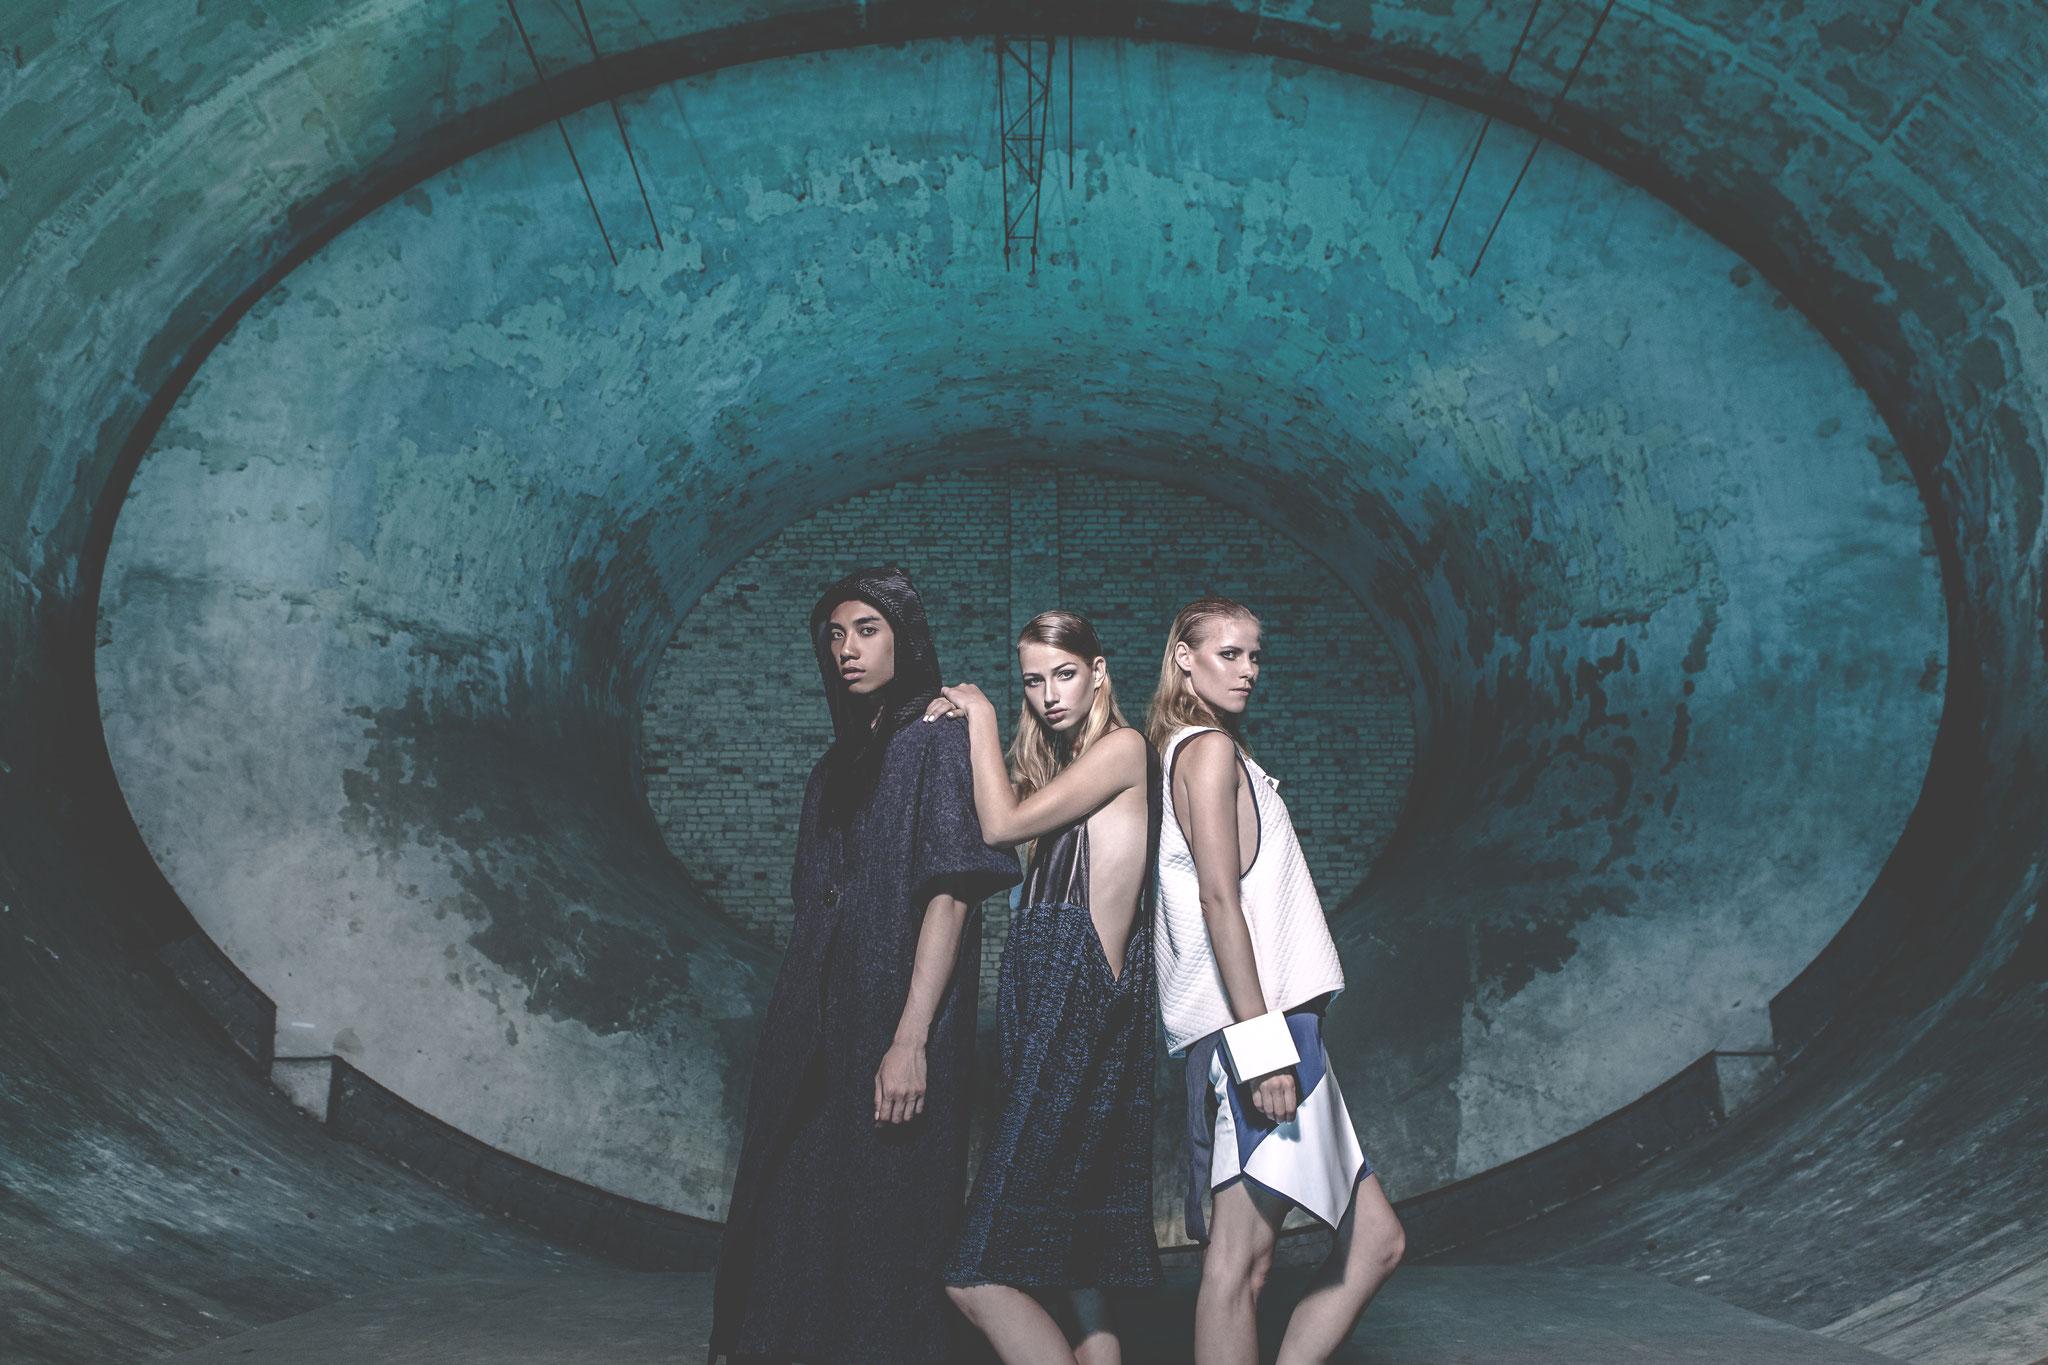 Models // Byrd / Hannah Peschanel / Sabrina Gehrmann